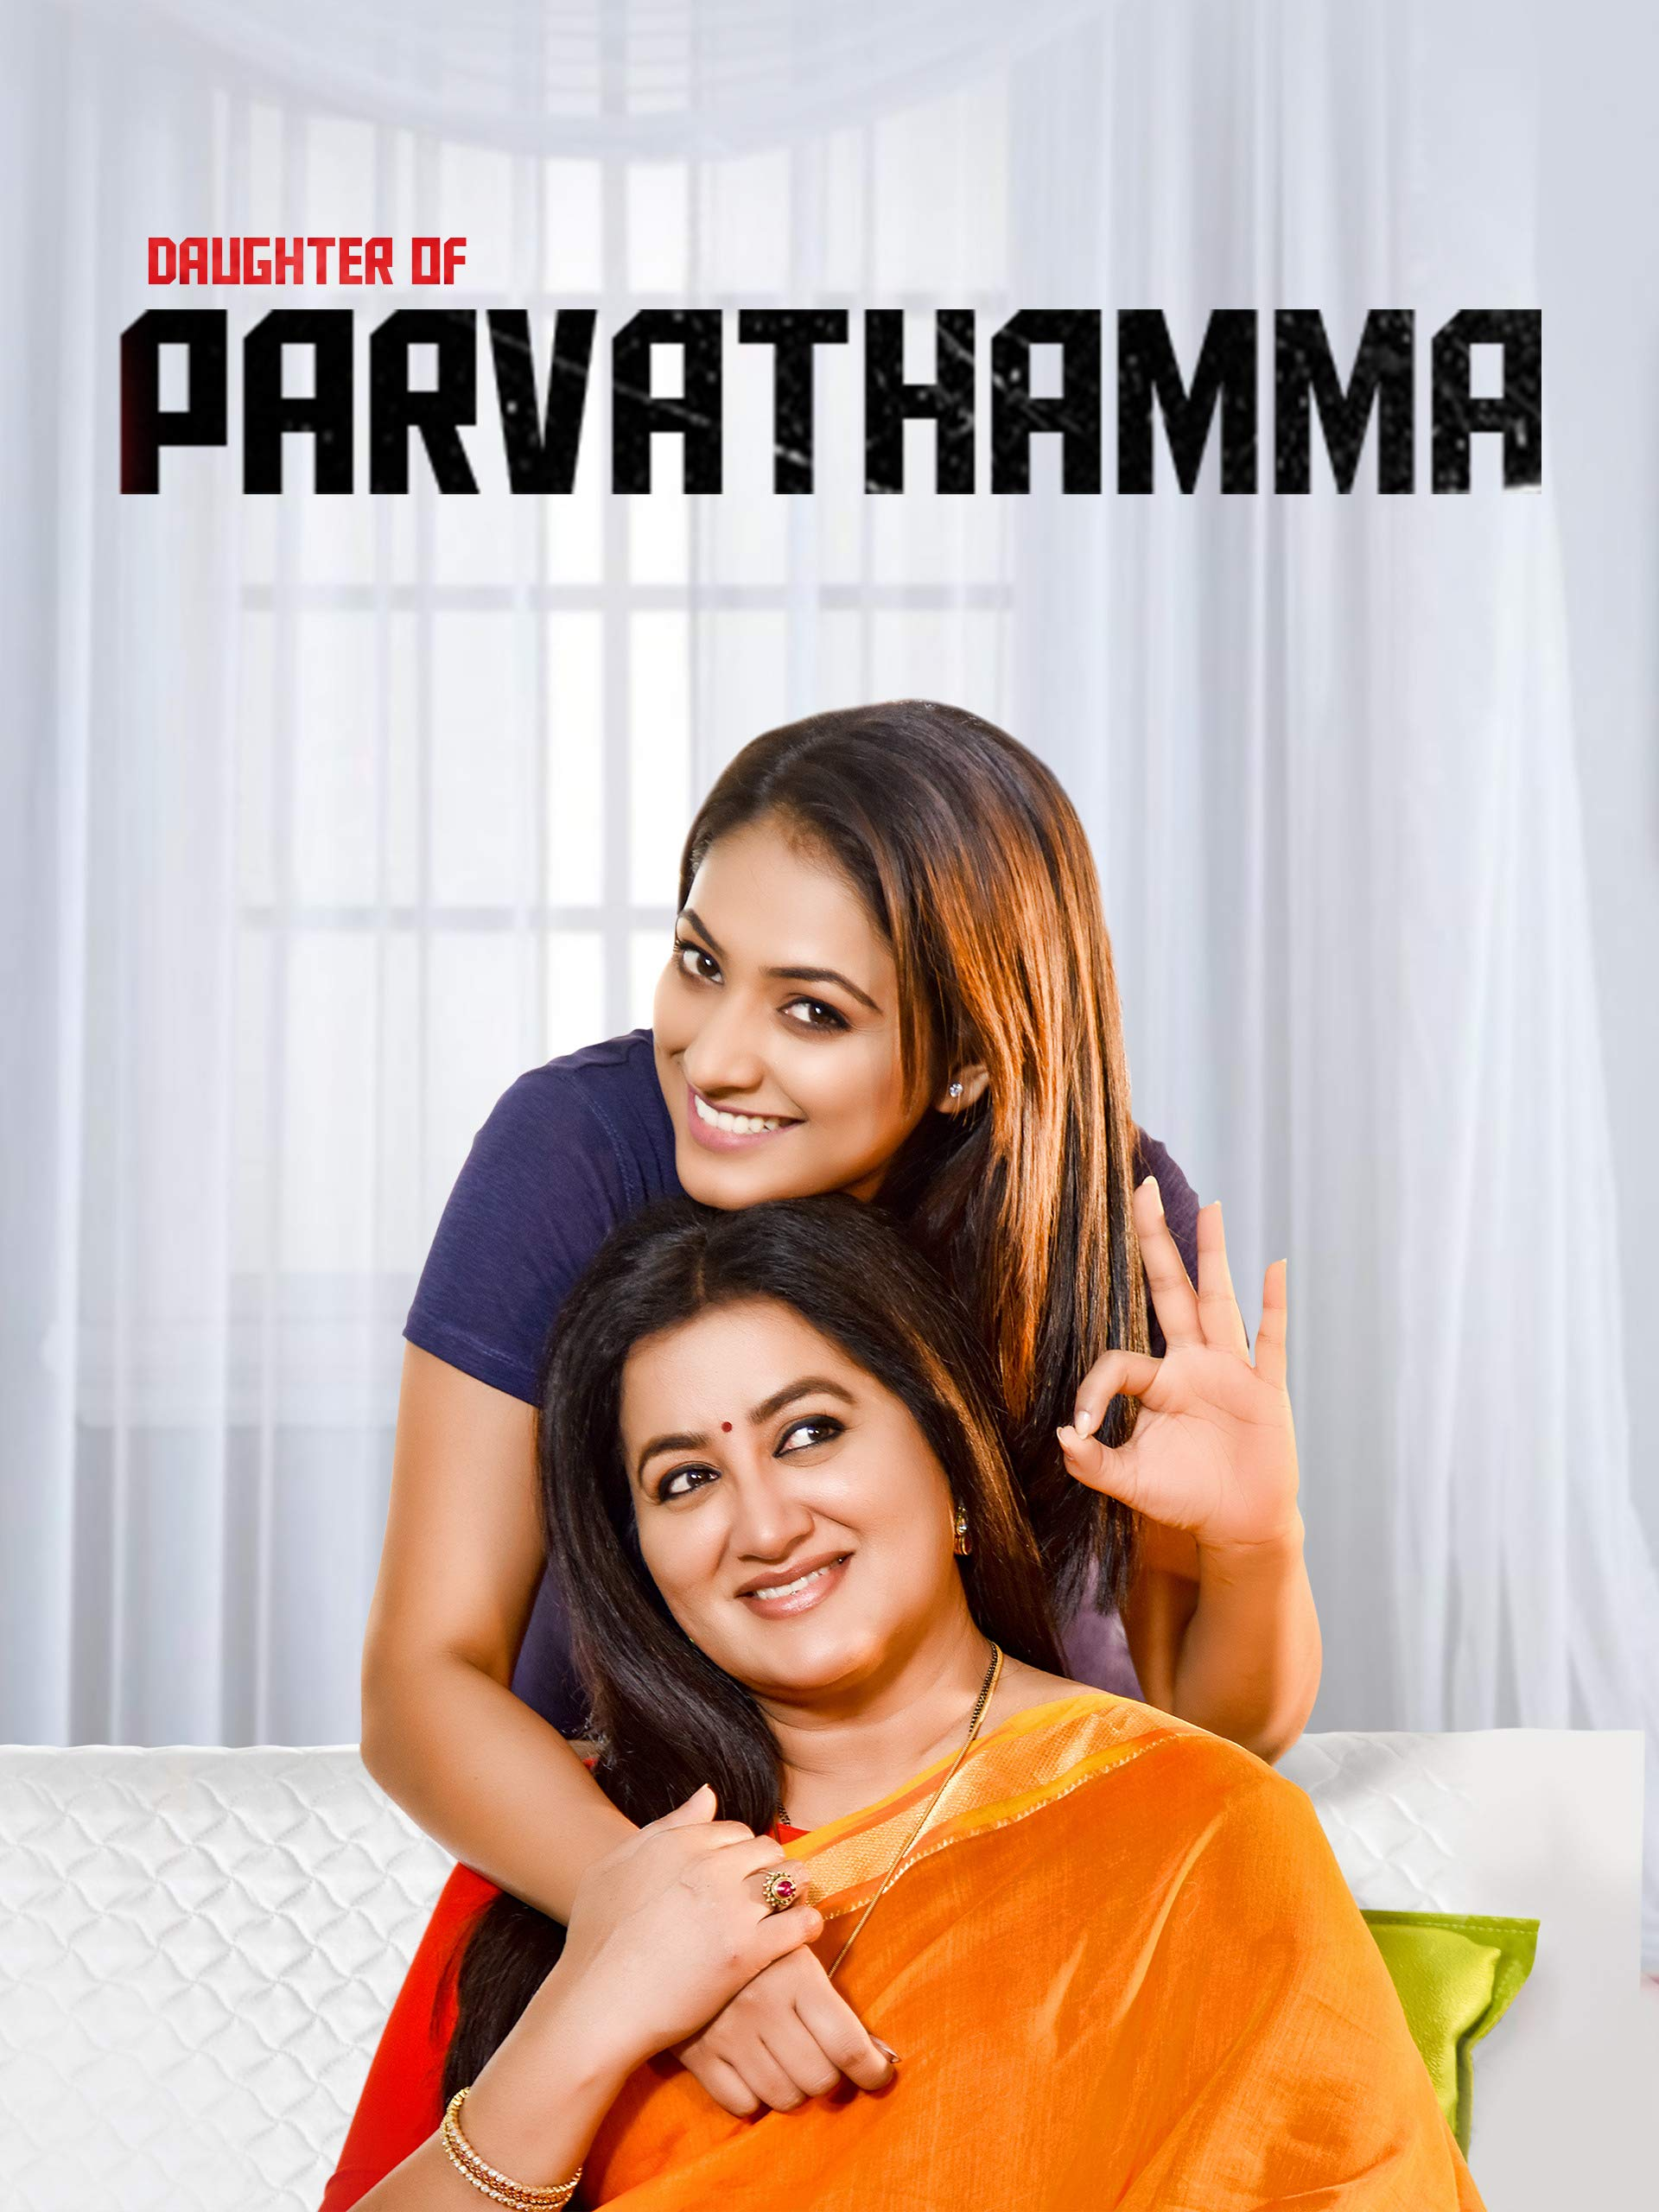 D/O Parvathamma